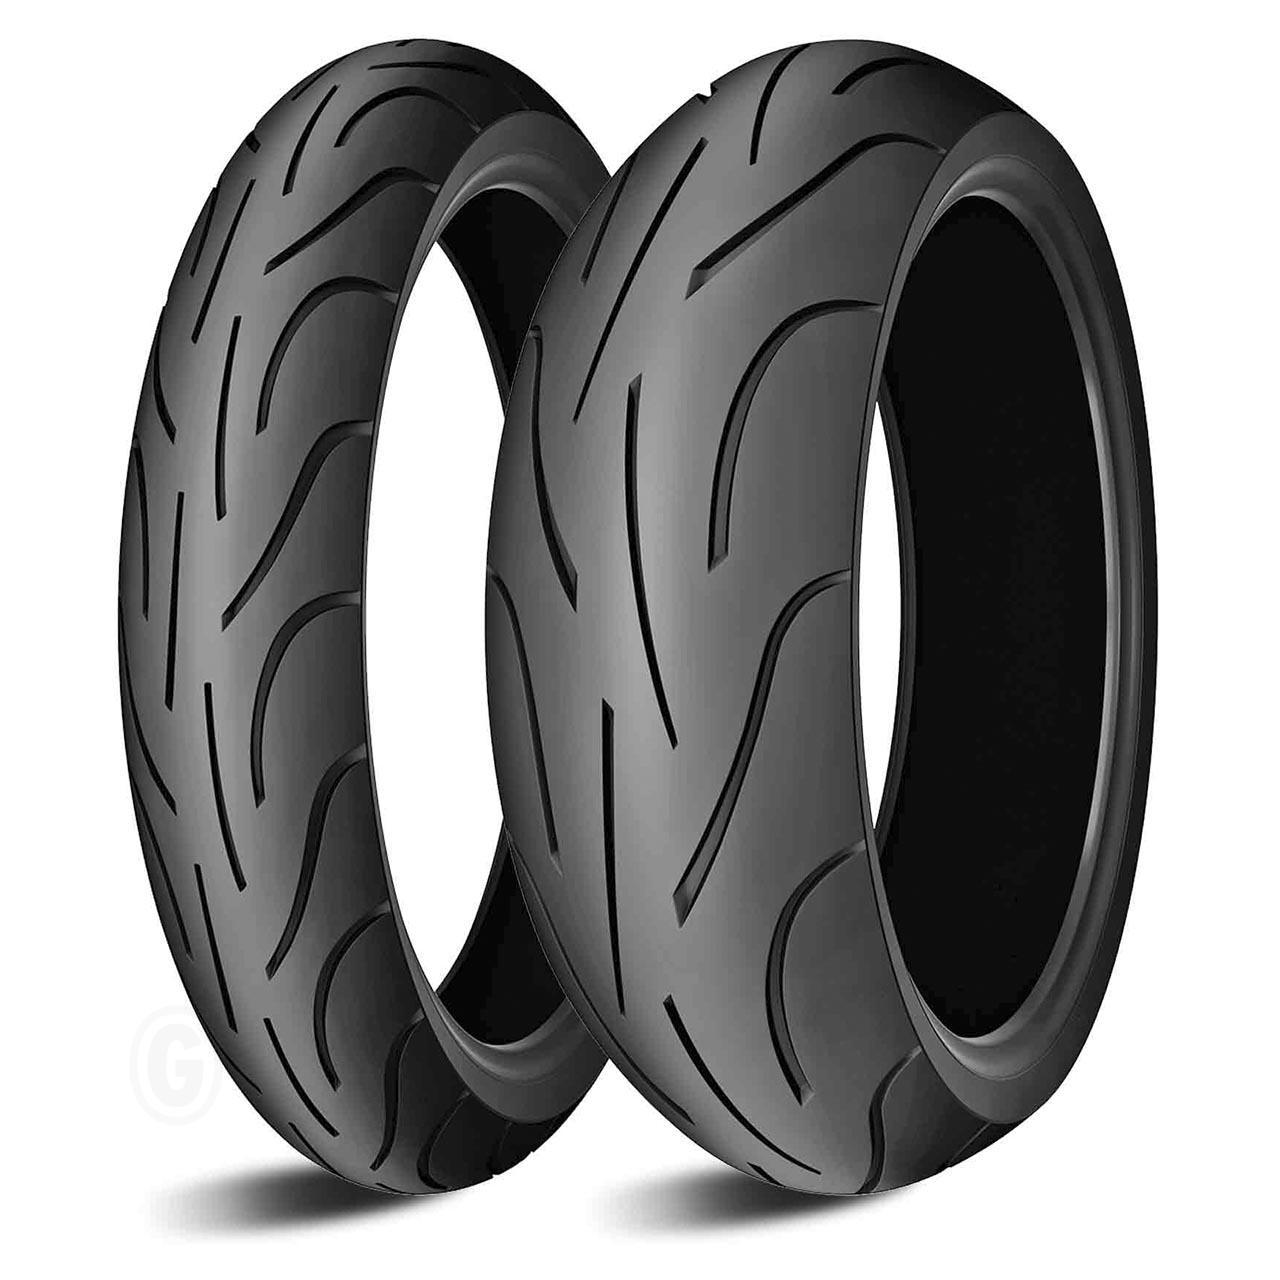 Michelin Pilot Power Front 120/70ZR17 M/C (58W) TL